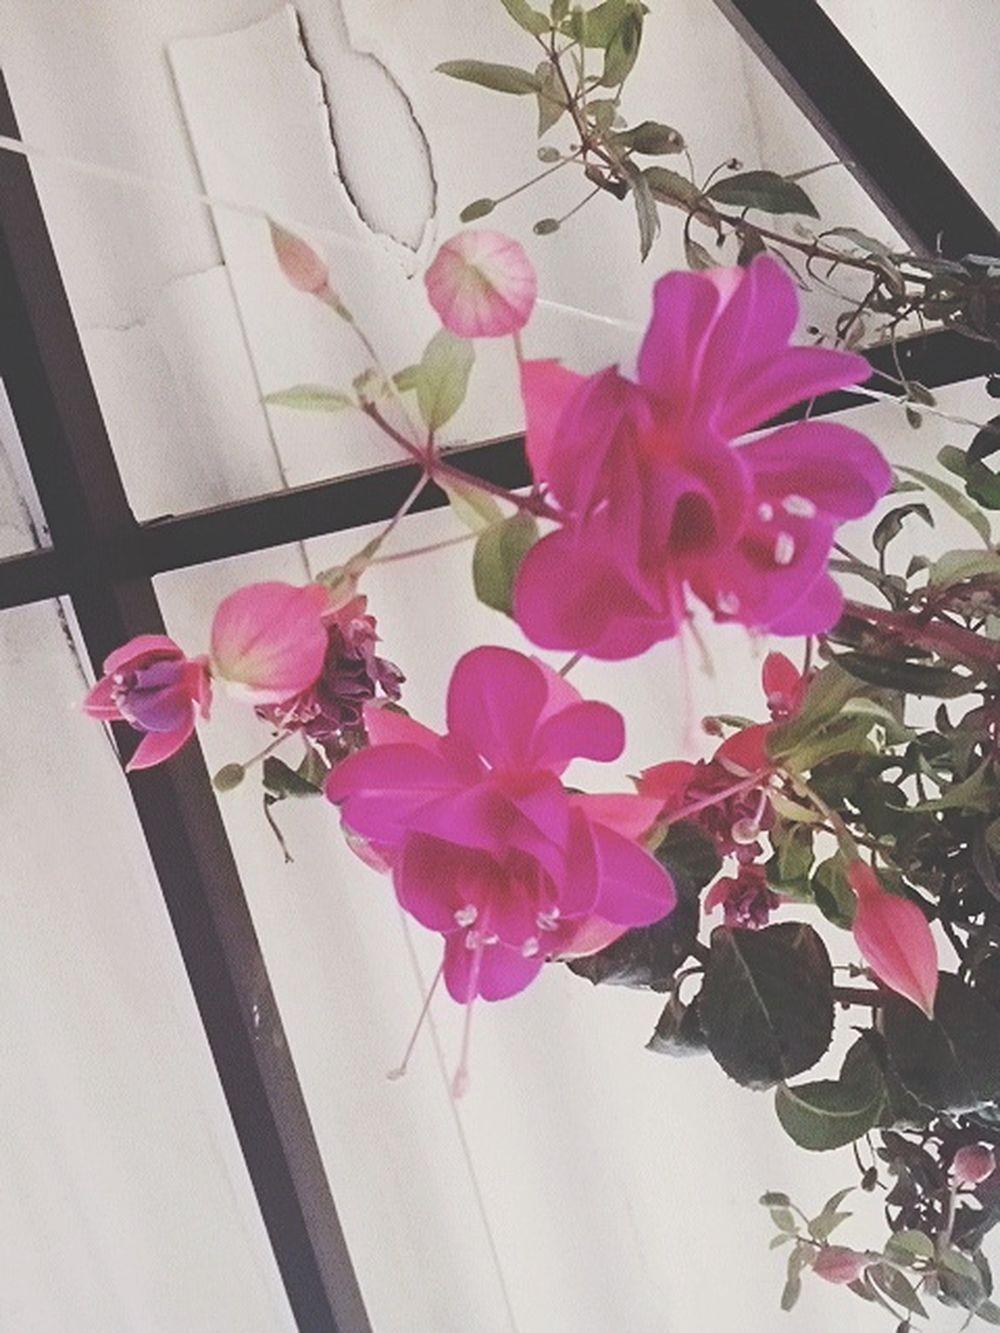 Flowers Caqueza Natural Beauty